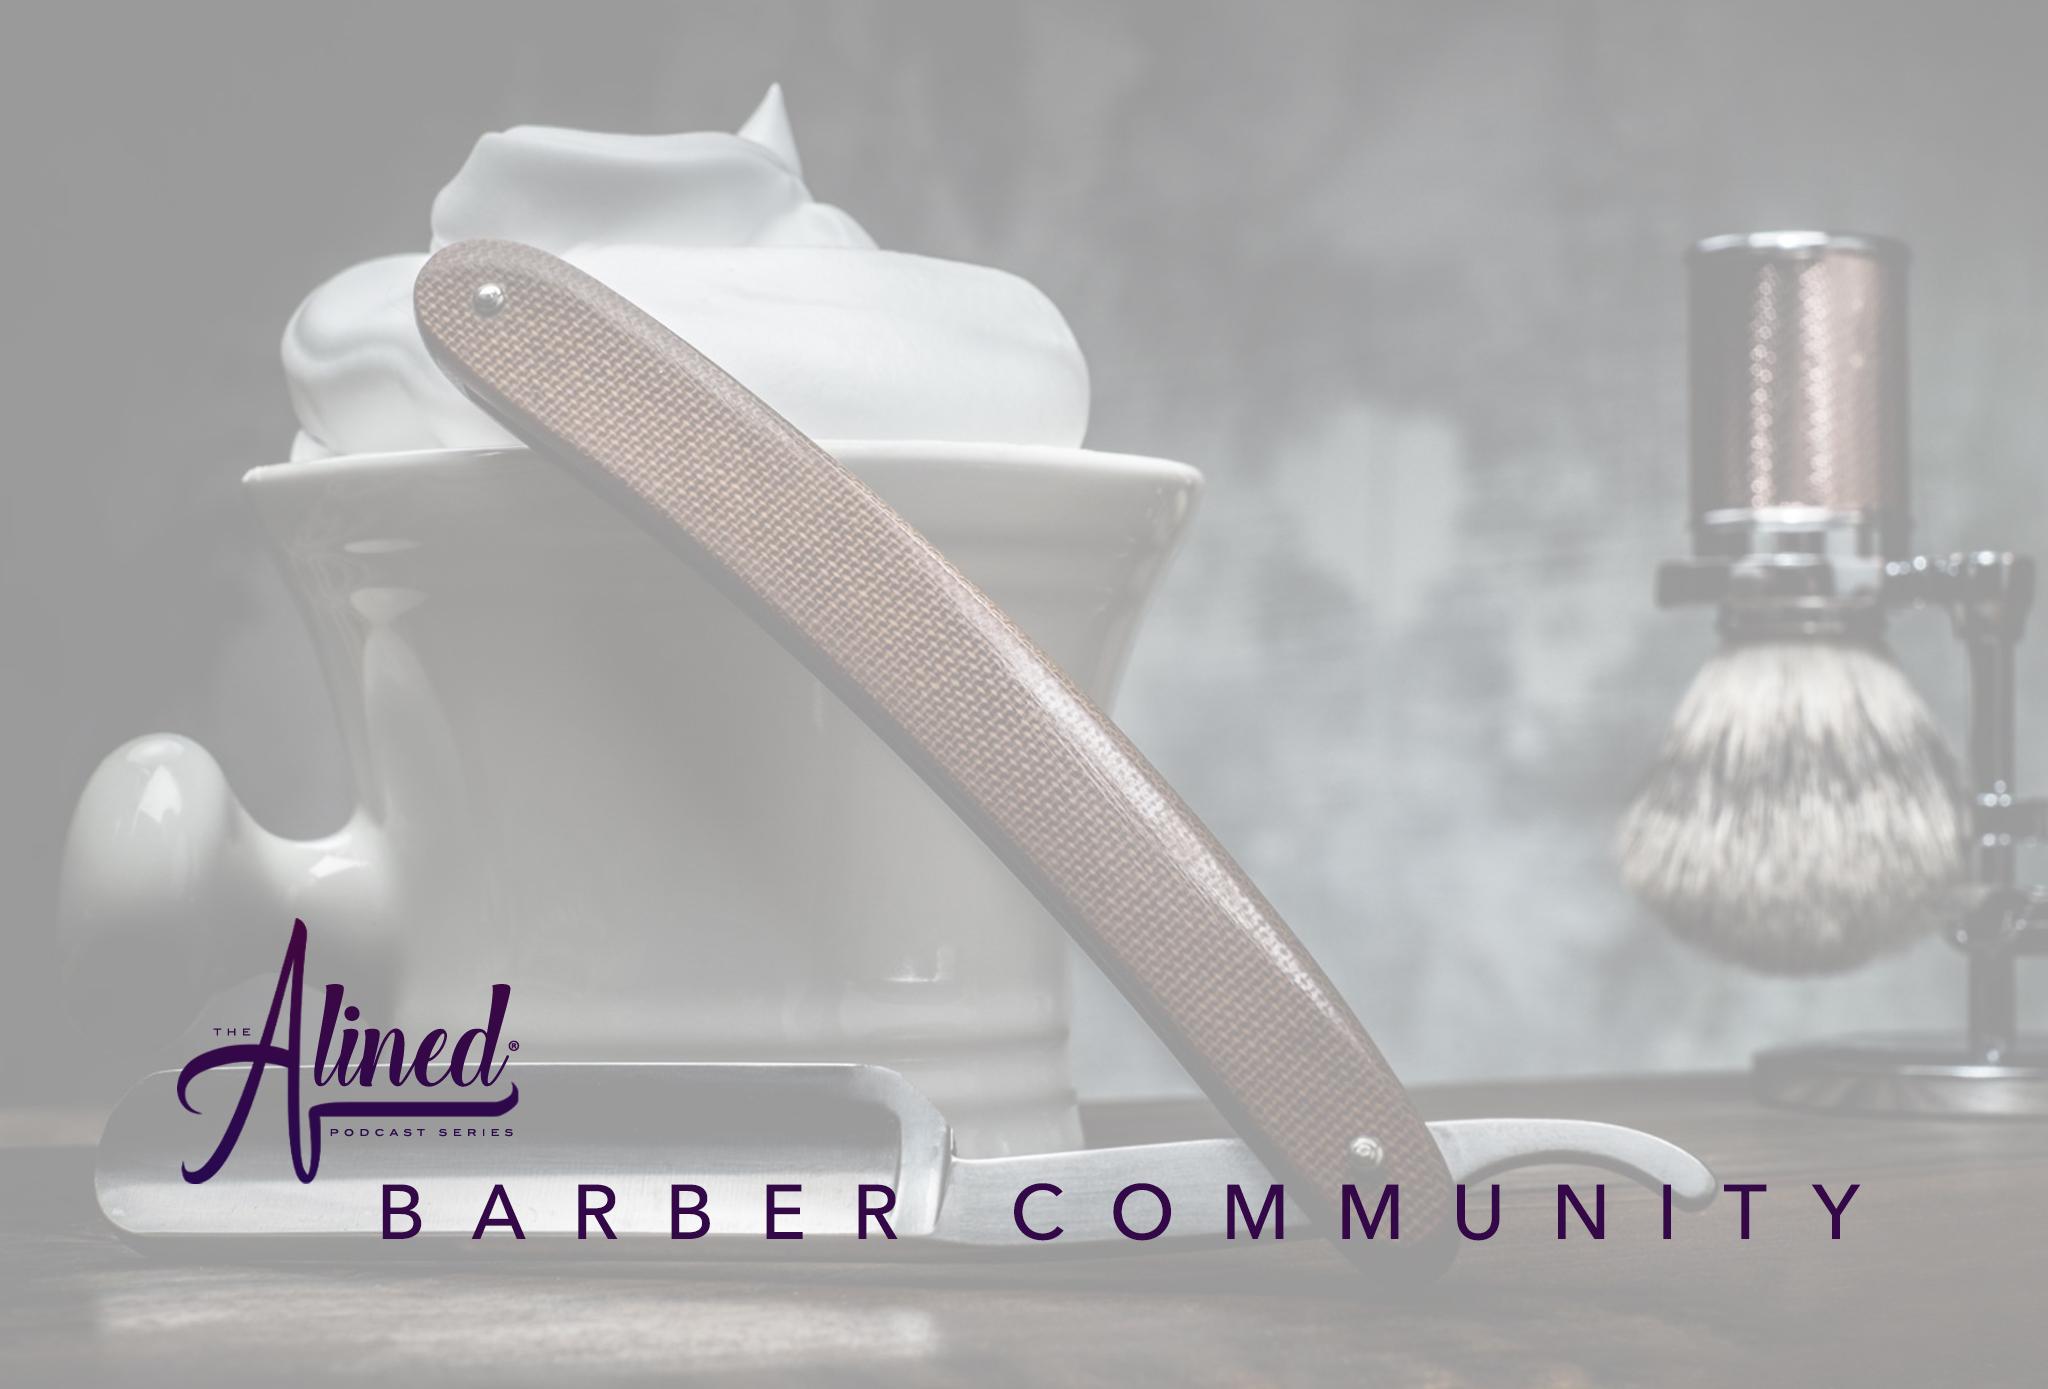 Alined Barber Community